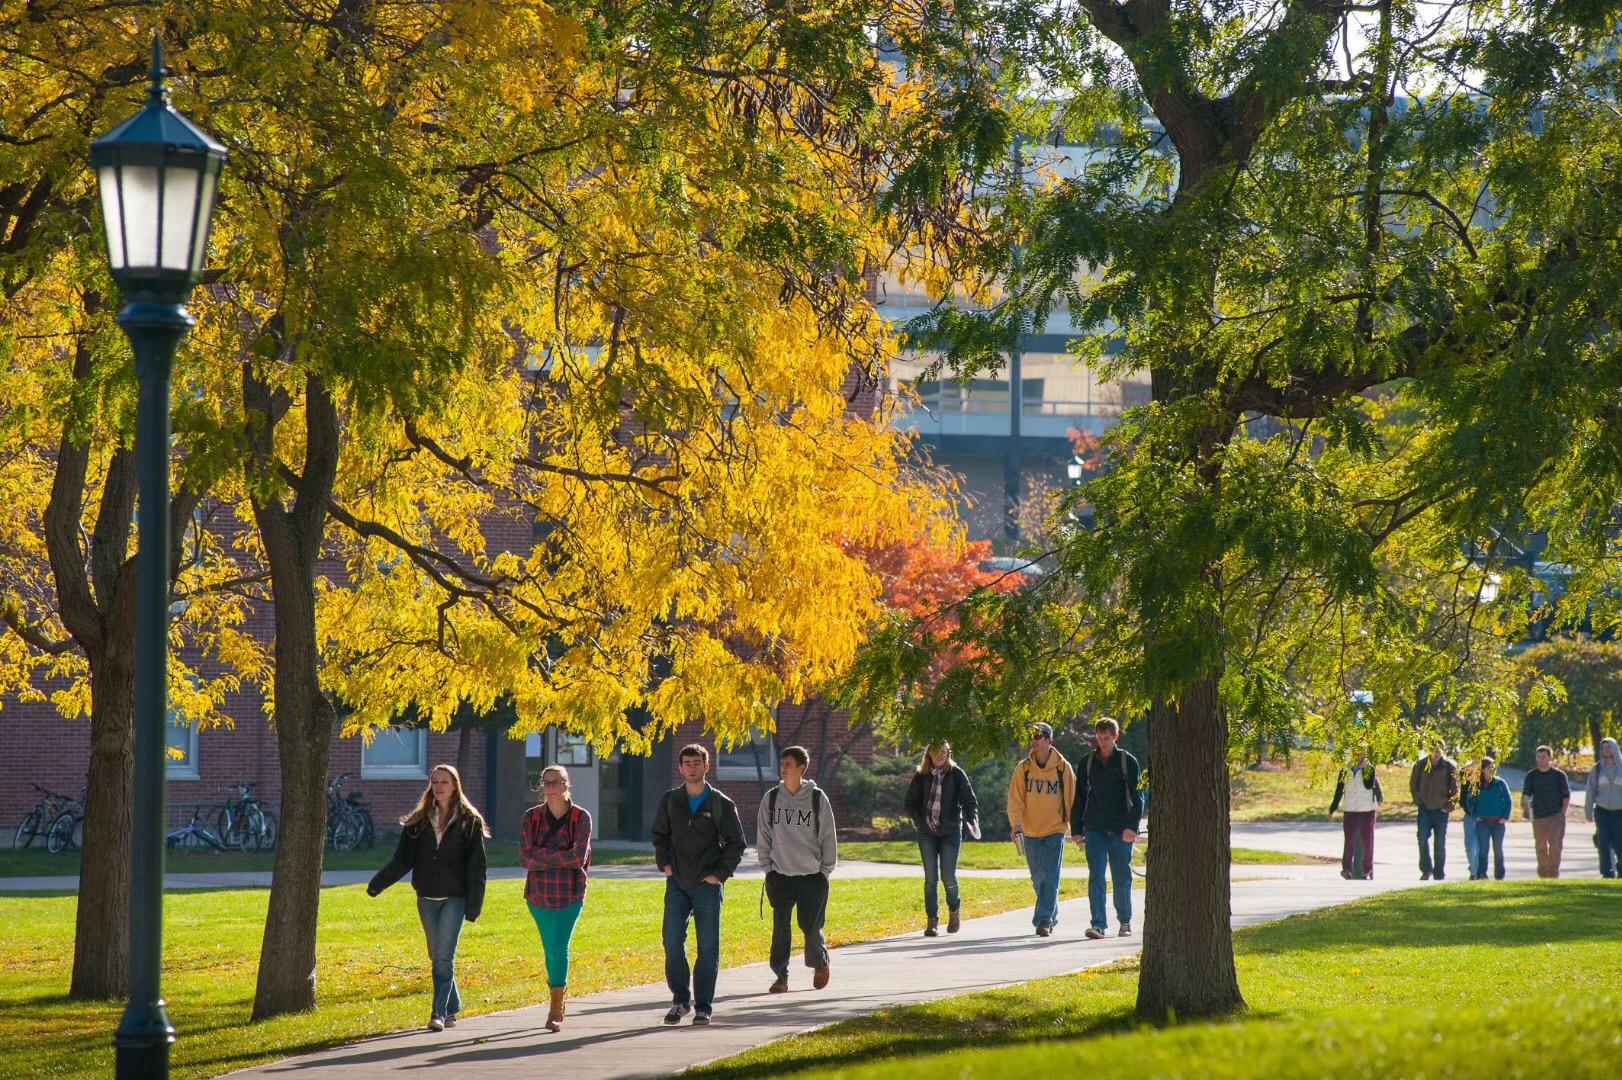 USNews2022美国大学排名公布!普林斯顿再次夺冠!哥大哈佛MIT并列第二!